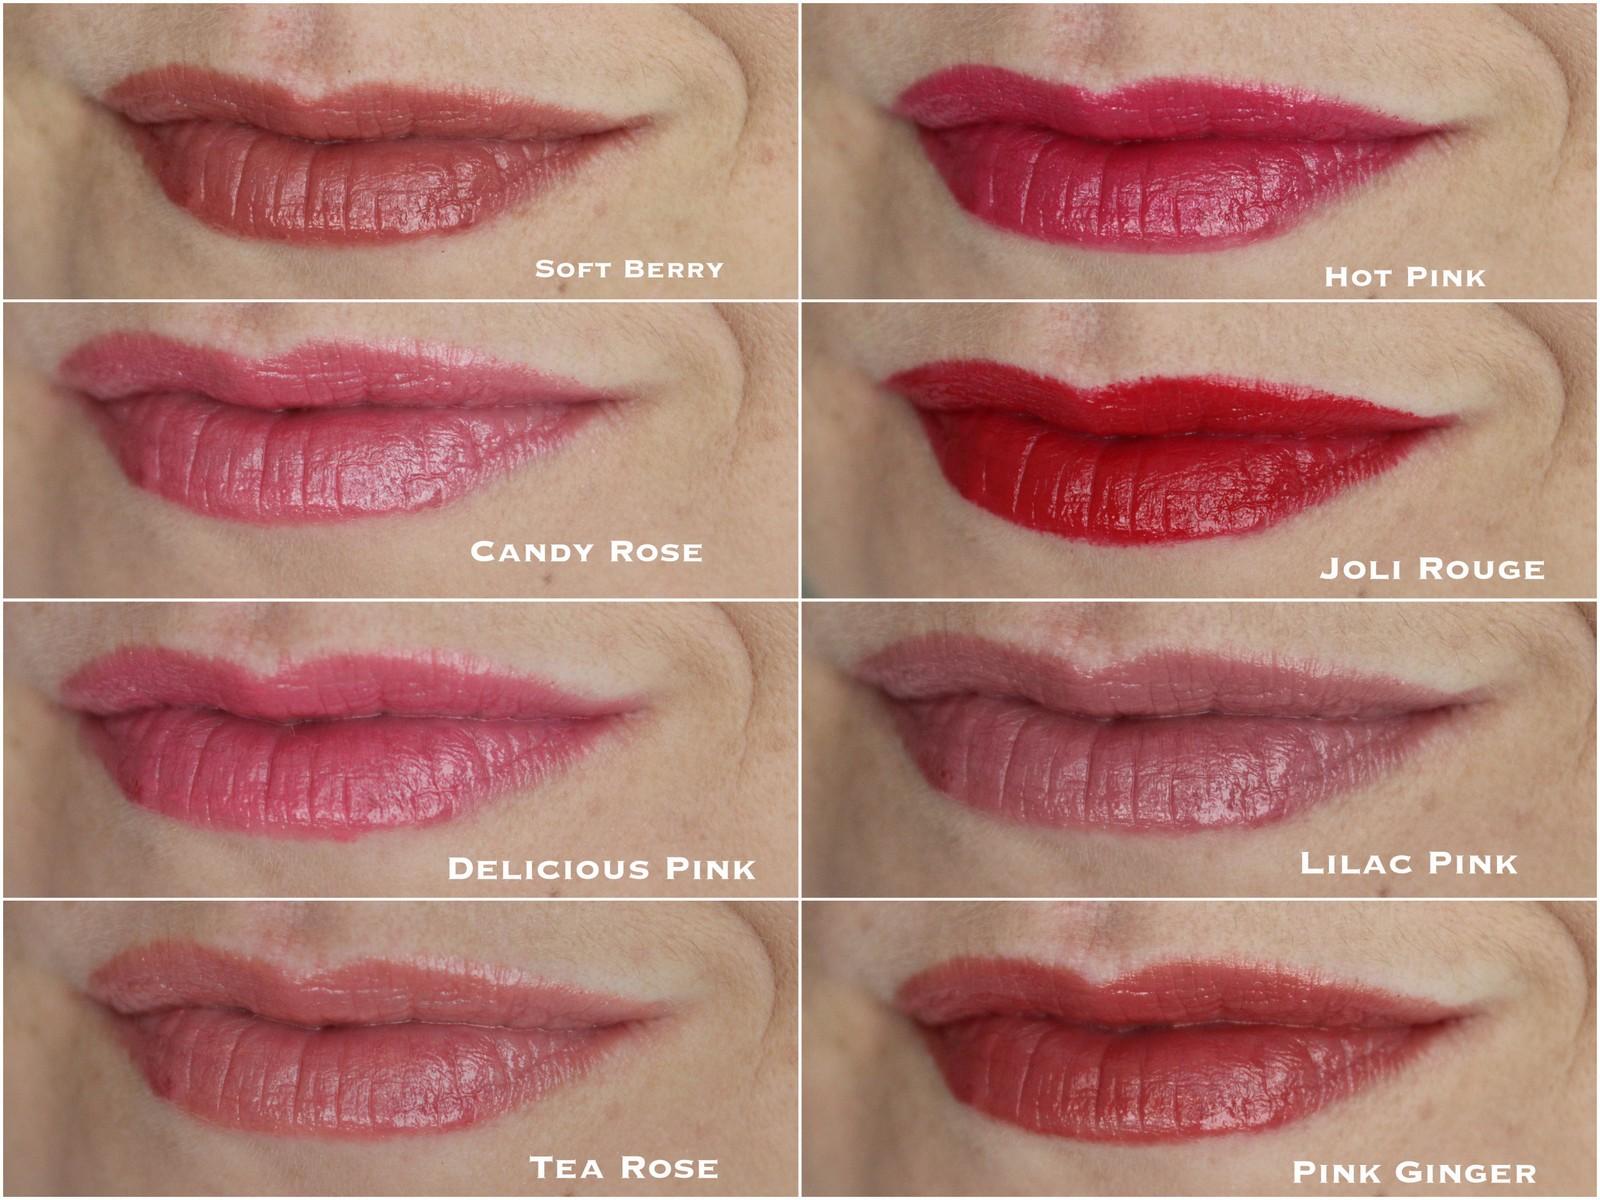 clarins joli rouge